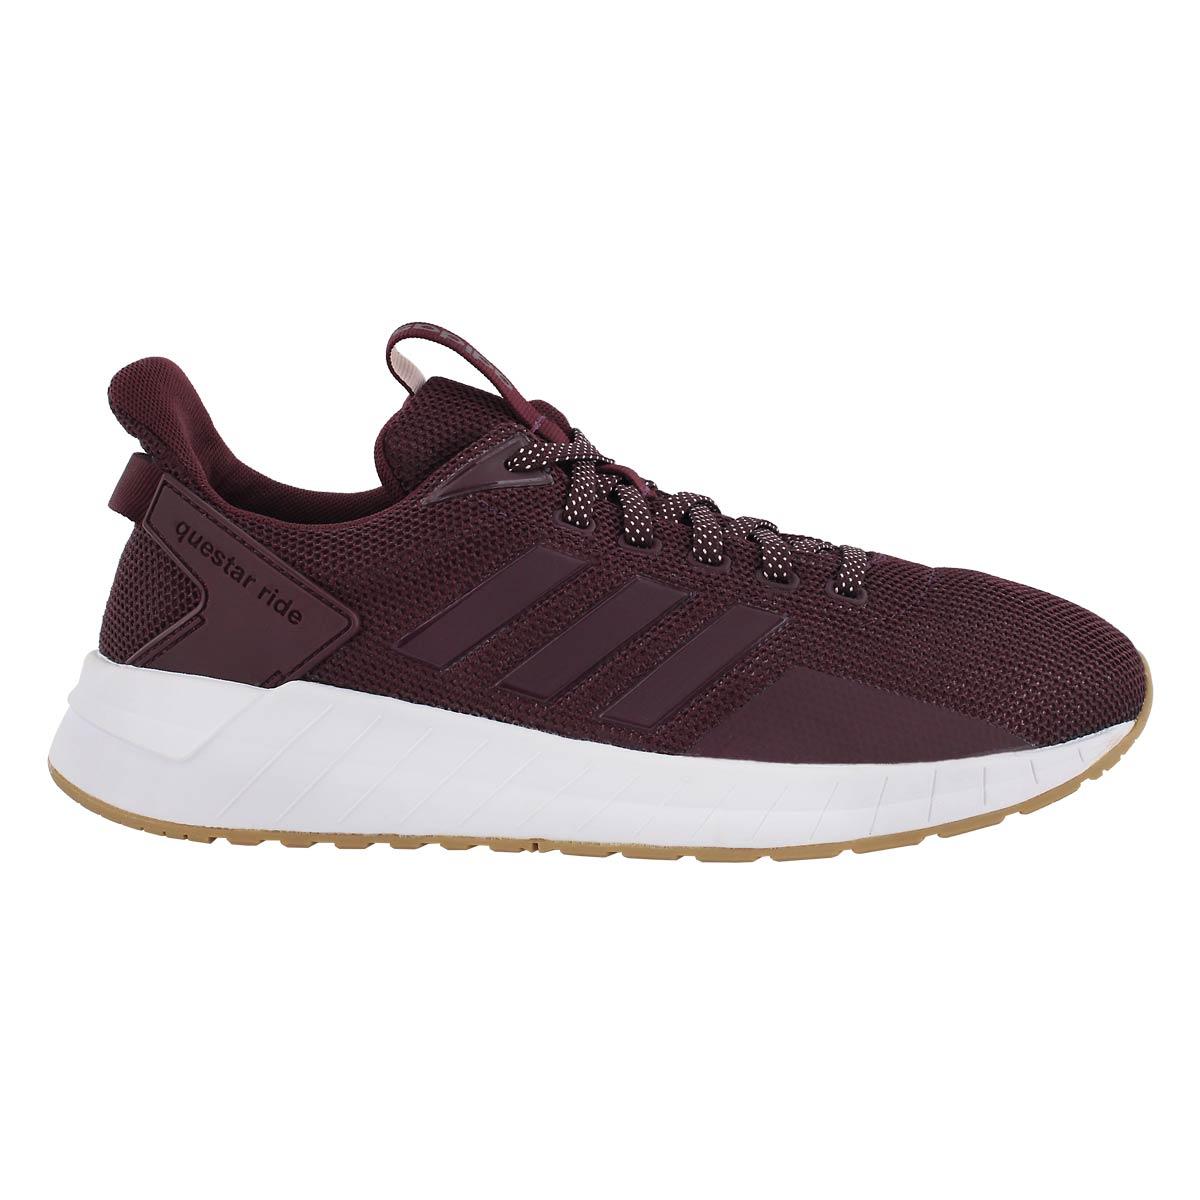 Lds Questar Ride maroon running shoe